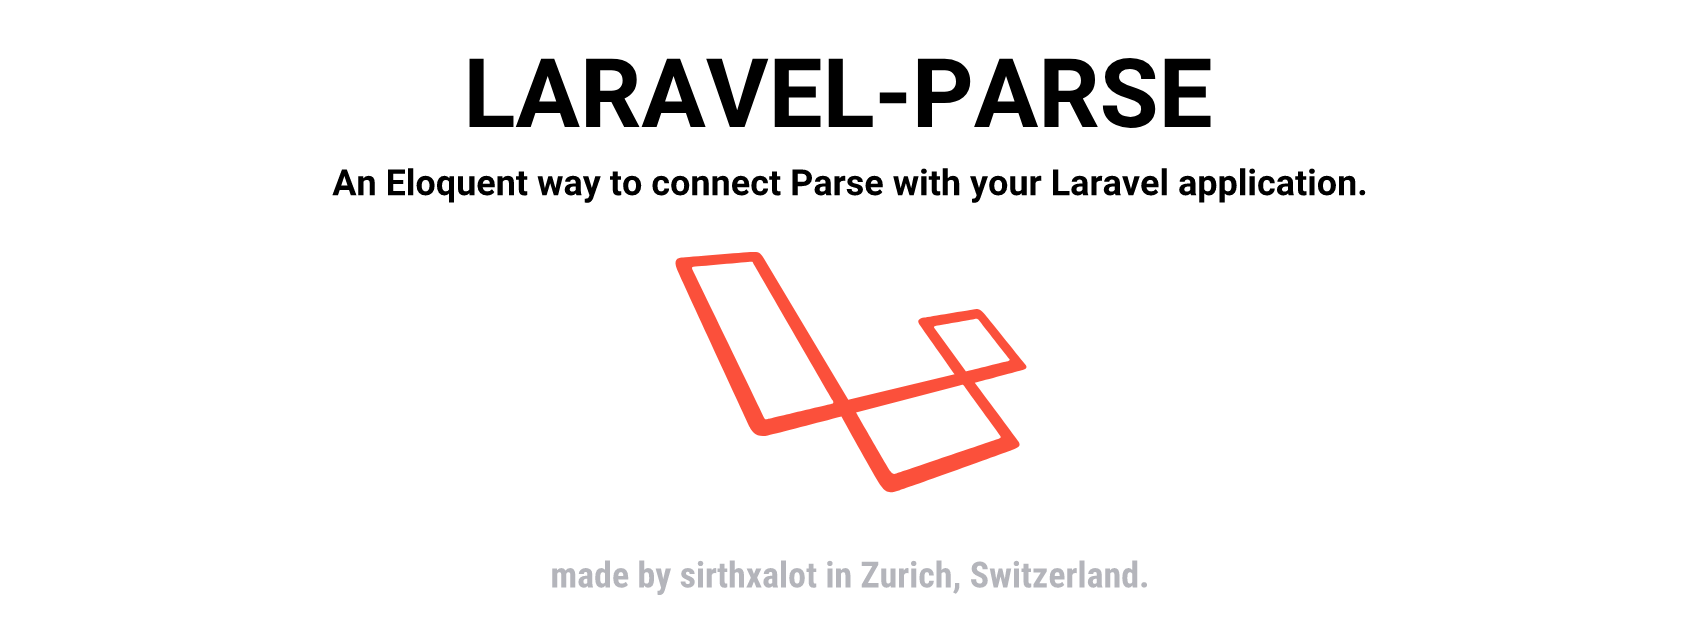 Laravel 5.3 Support